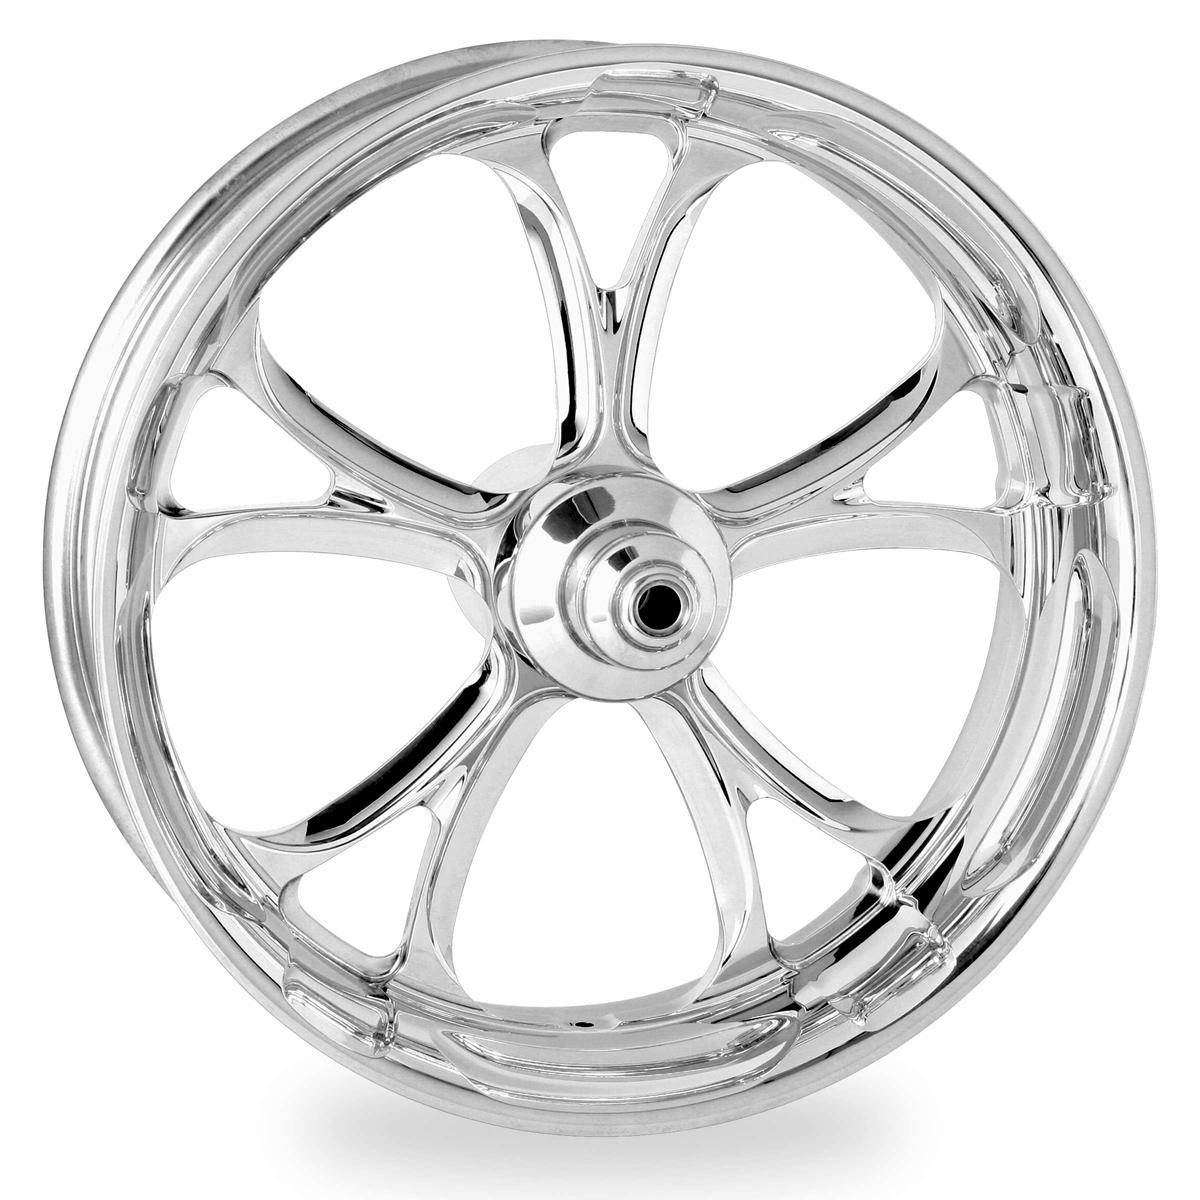 Performance Machine Luxe Chrome Front Wheel 23x3.5 Non-ABS